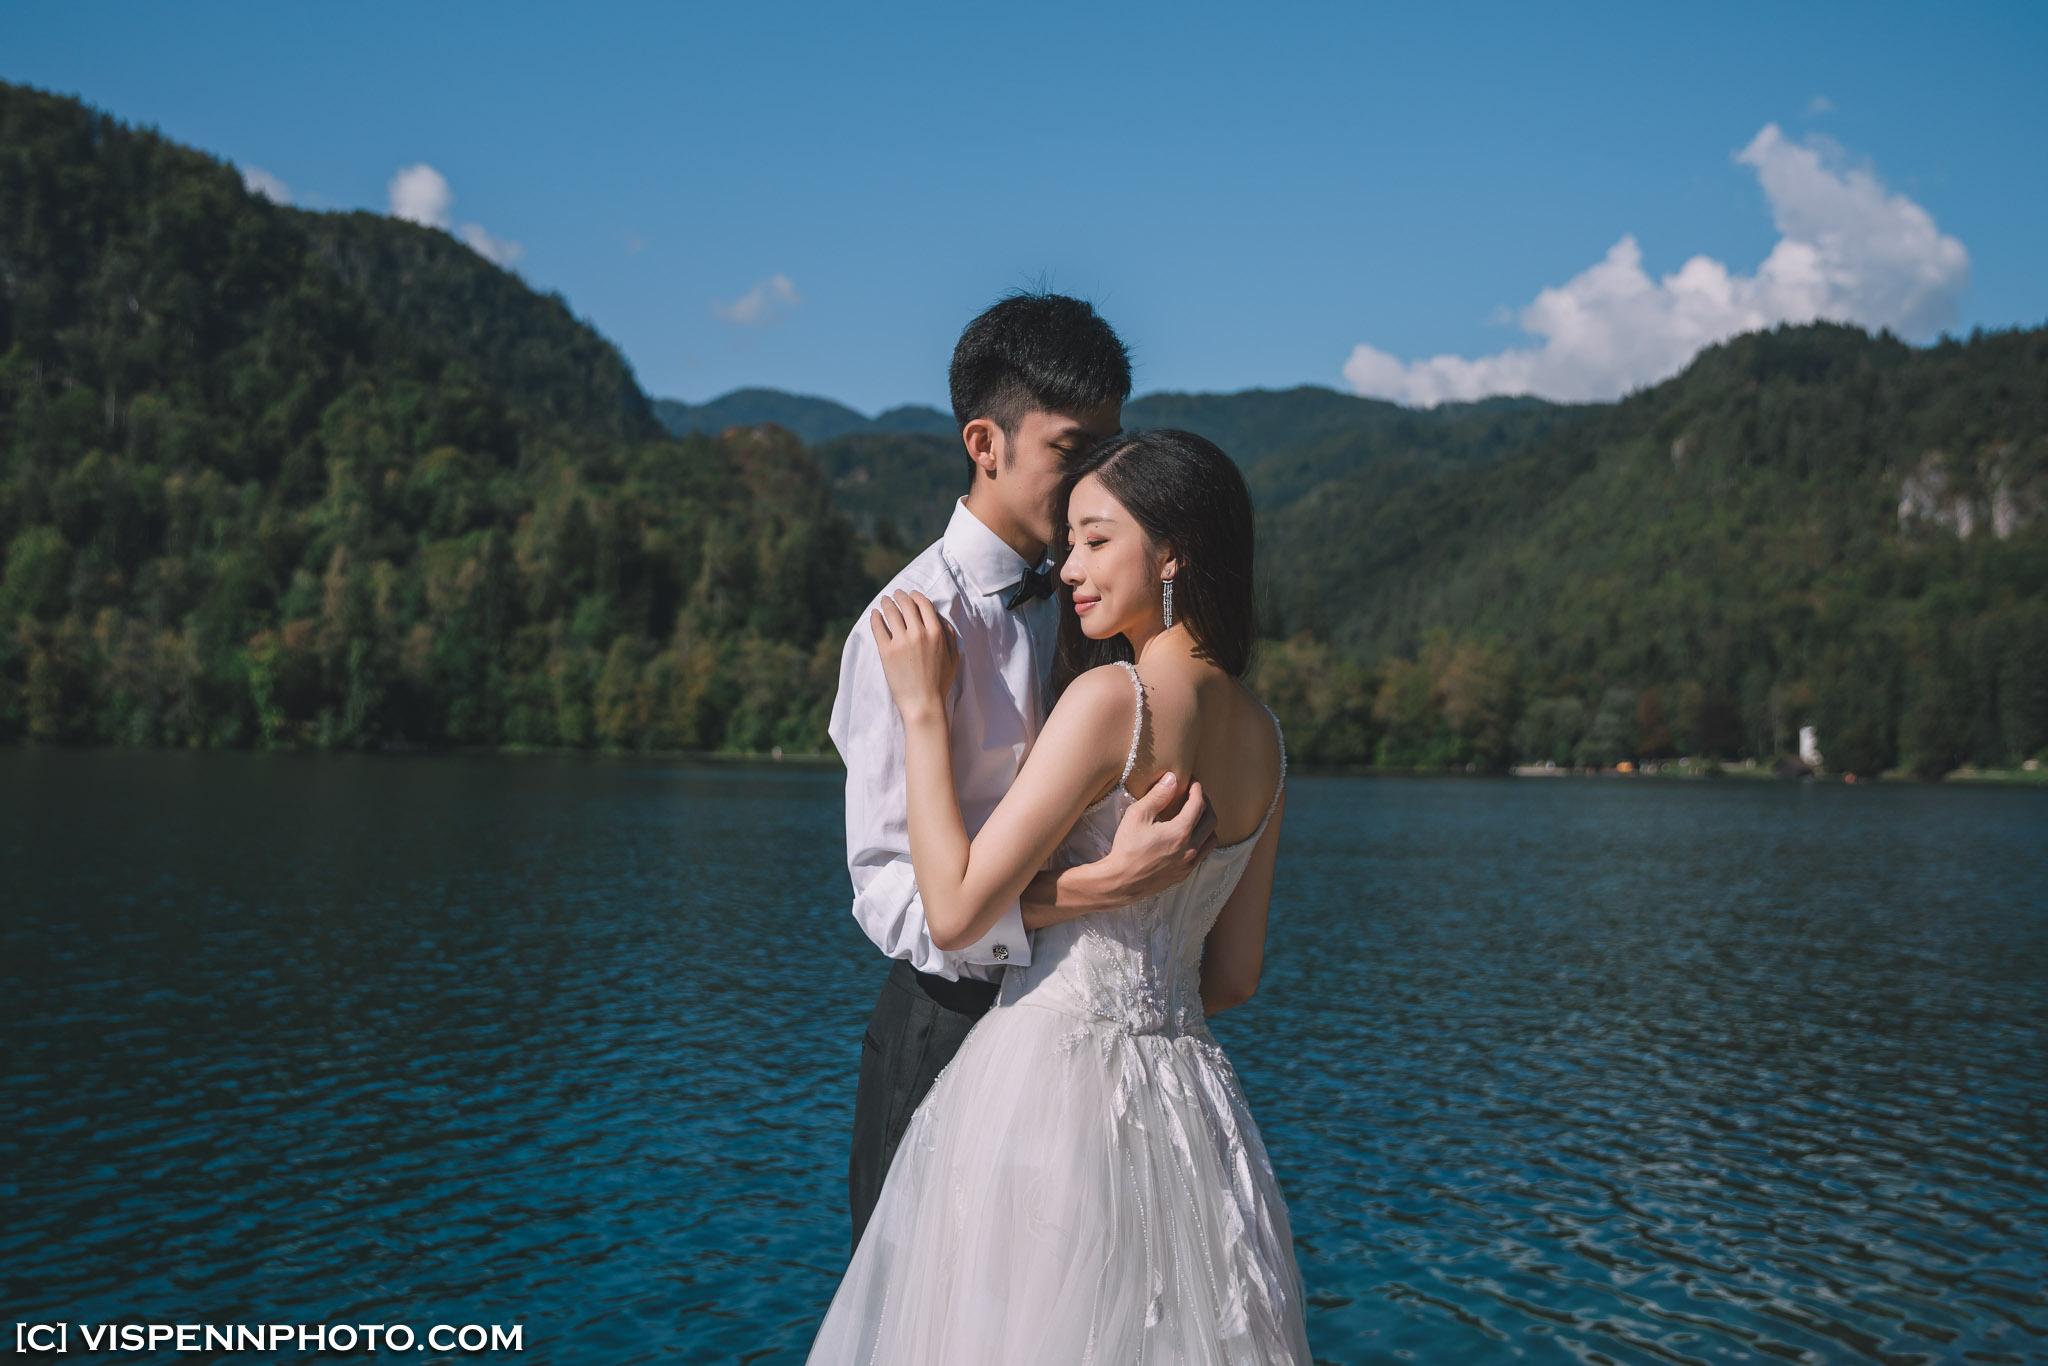 PRE WEDDING Photography Melbourne VISPENN 墨尔本 婚纱照 结婚照 婚纱摄影 DSC03541